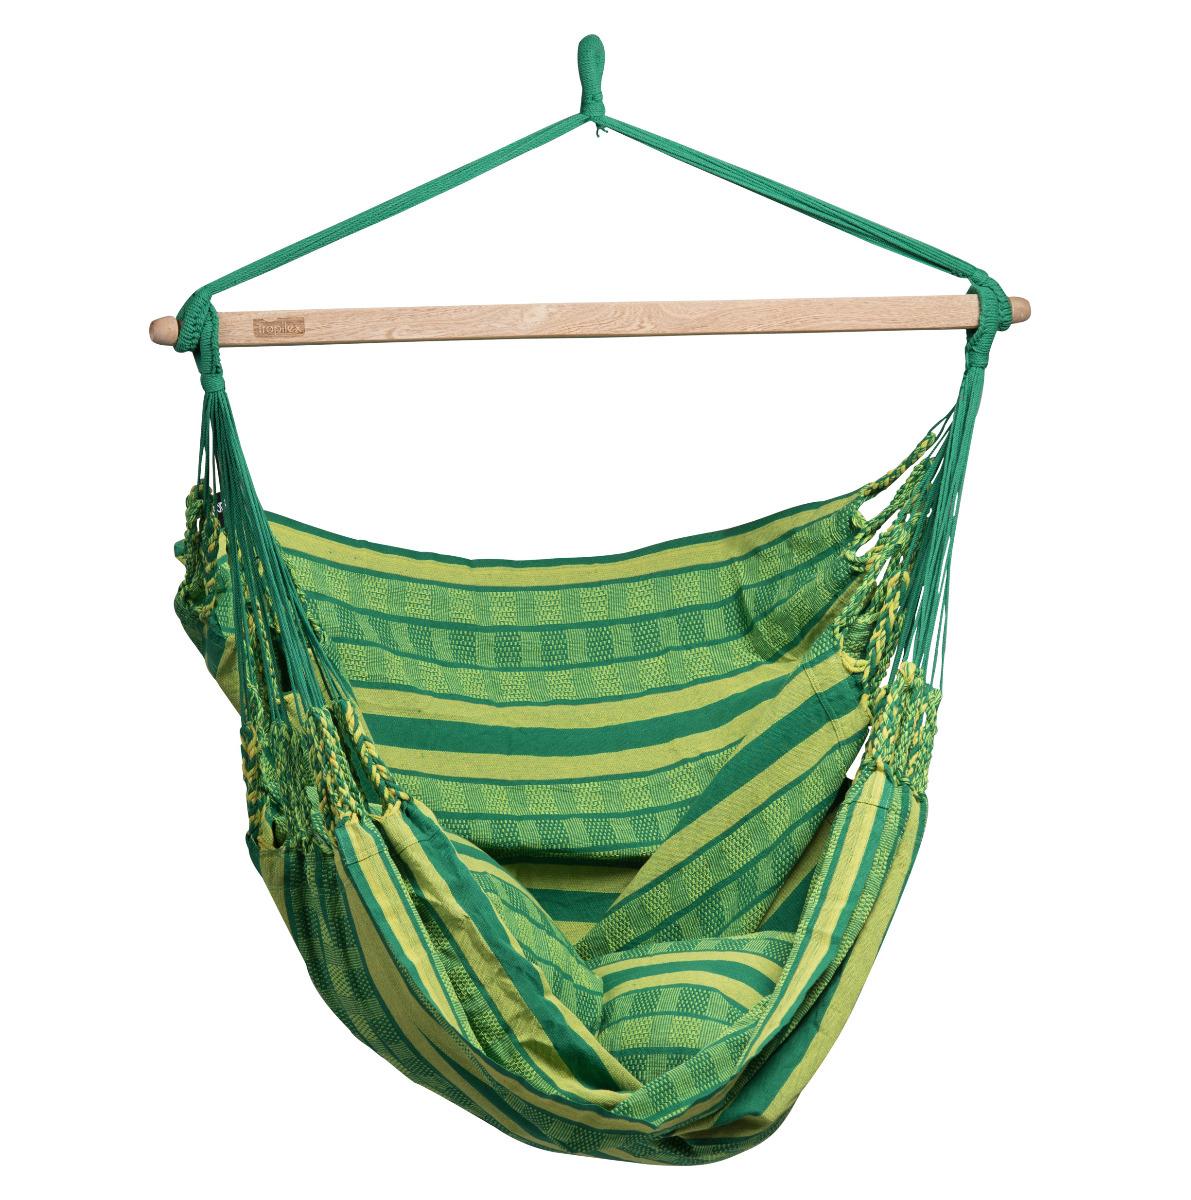 Hangstoel E�npersoons 'Chill' Joyful - Groen - Tropilex �